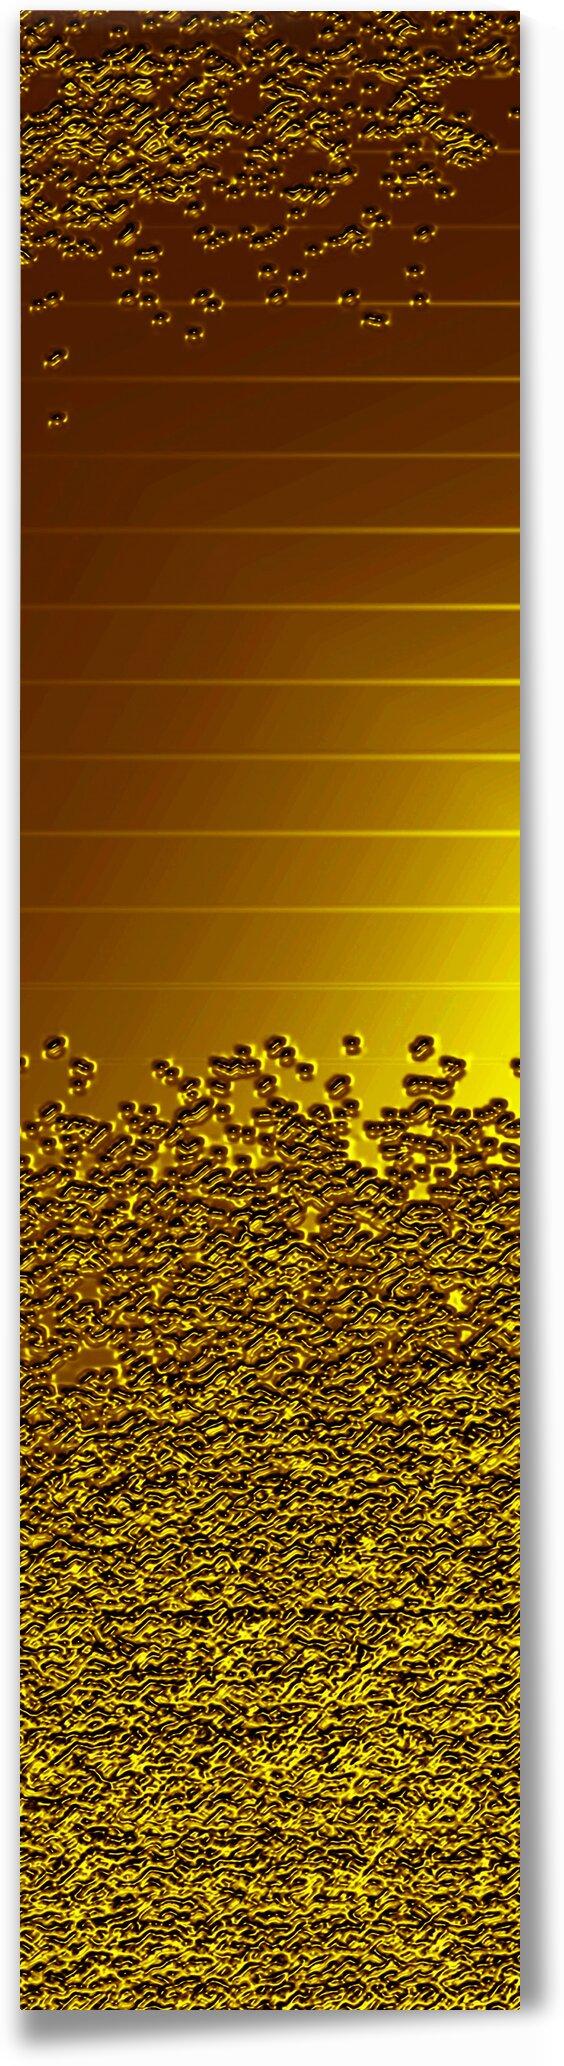 Golden - Flakes by Irmus Design